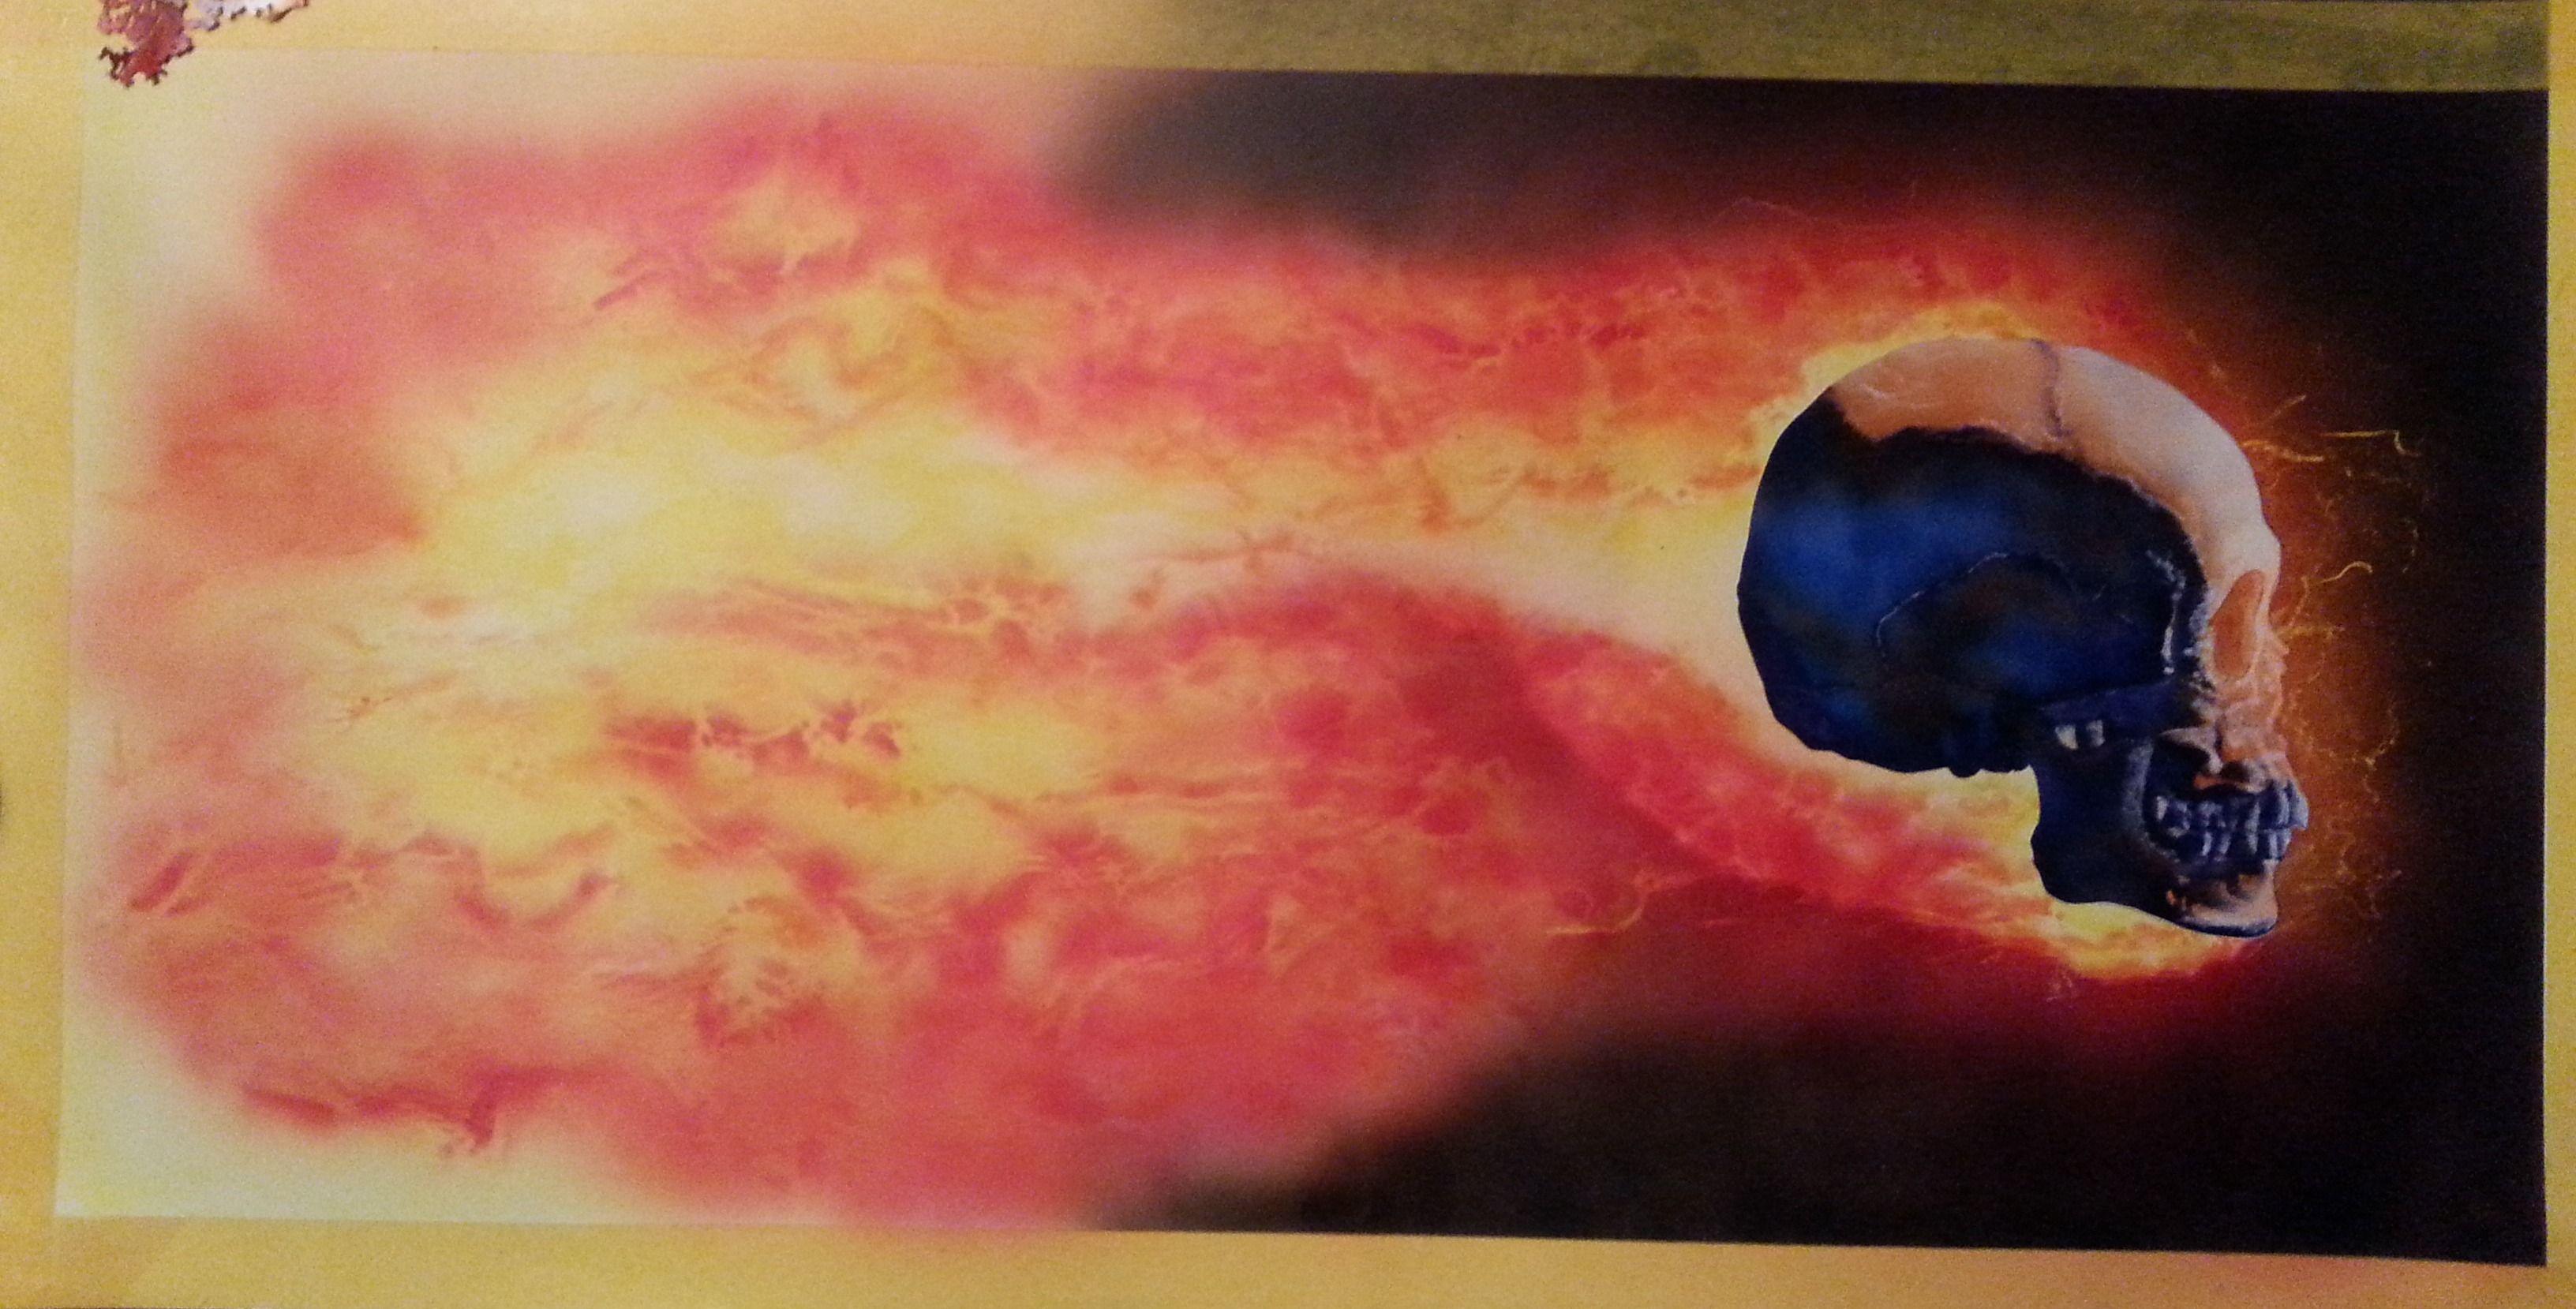 Skull with flames ( Dru Blair ) #9 (06.05.14) Étac. Schoelershammer paper. HS Infinity